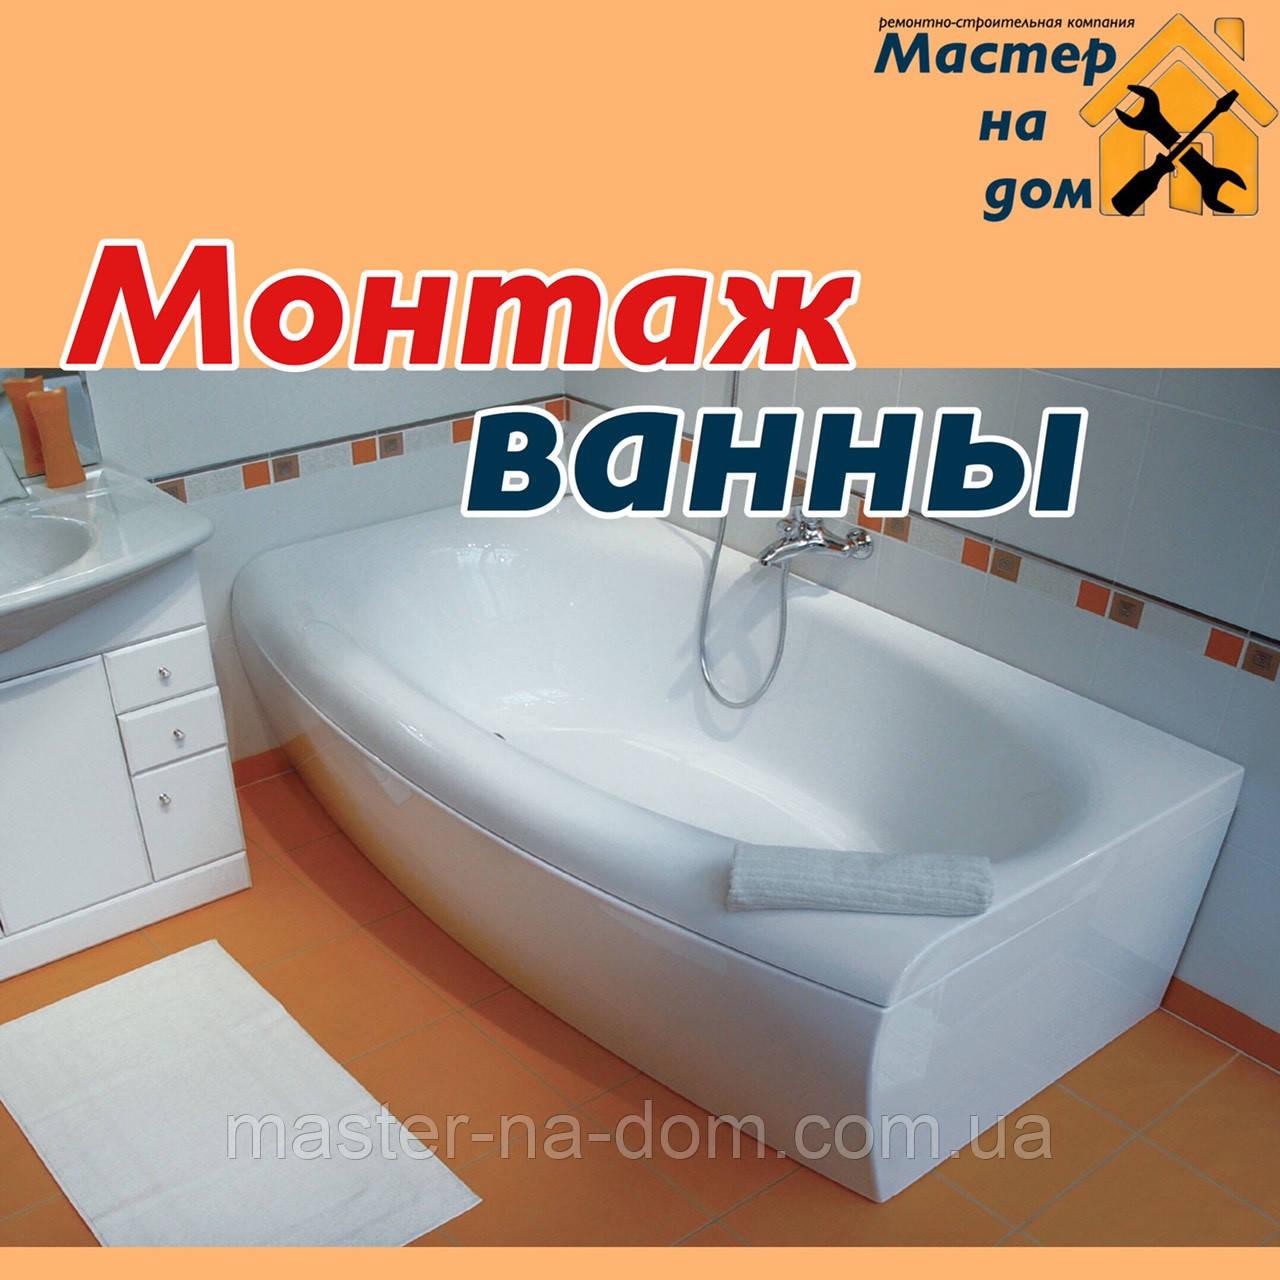 Монтаж ванны в Ивано-Франковске